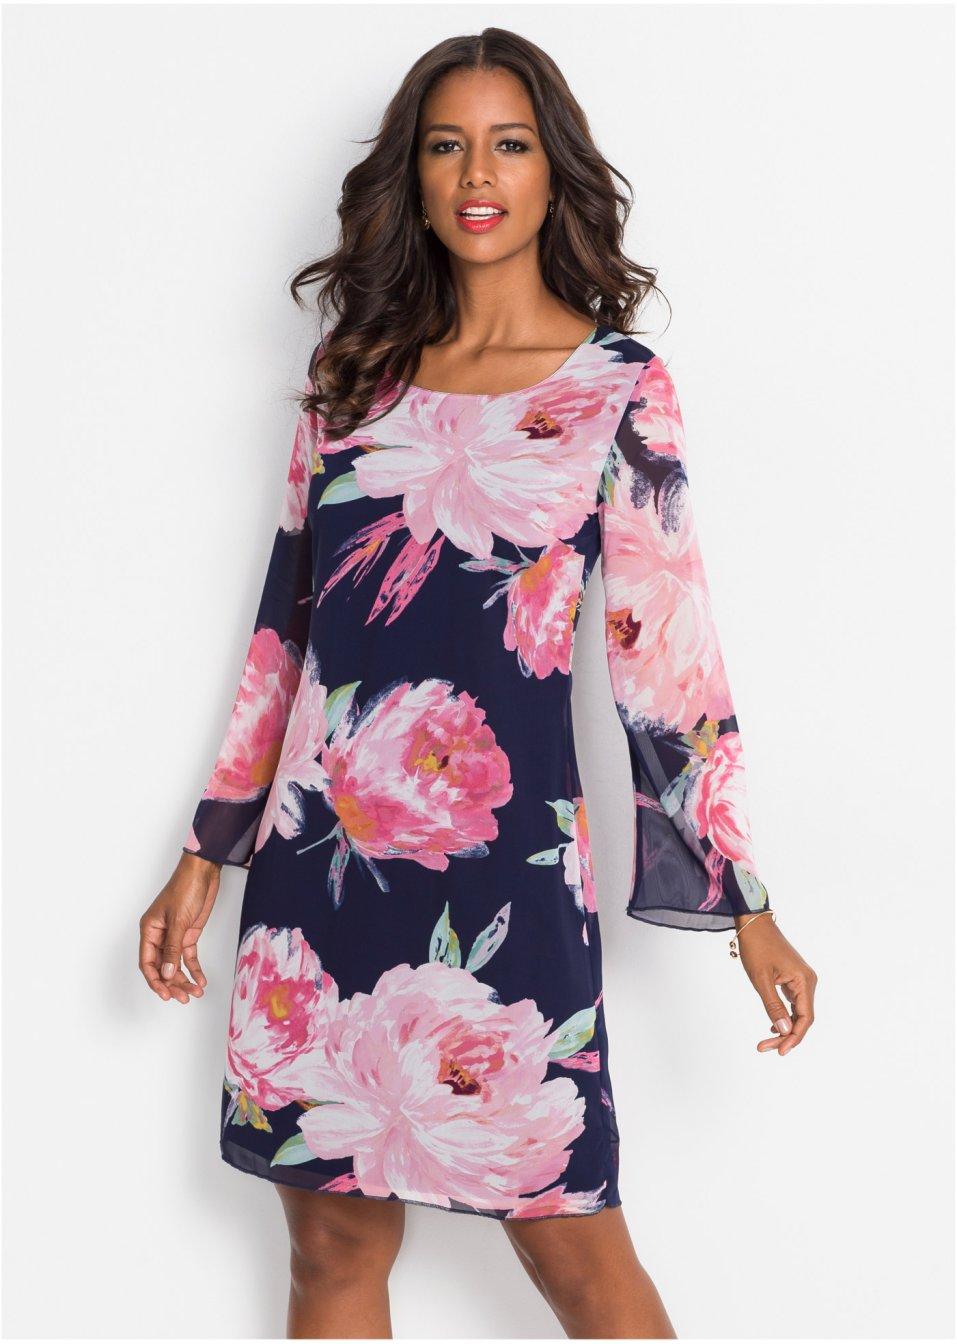 Kleid mit Blumenprint dunkelblau/rosa geblümt - Damen ...